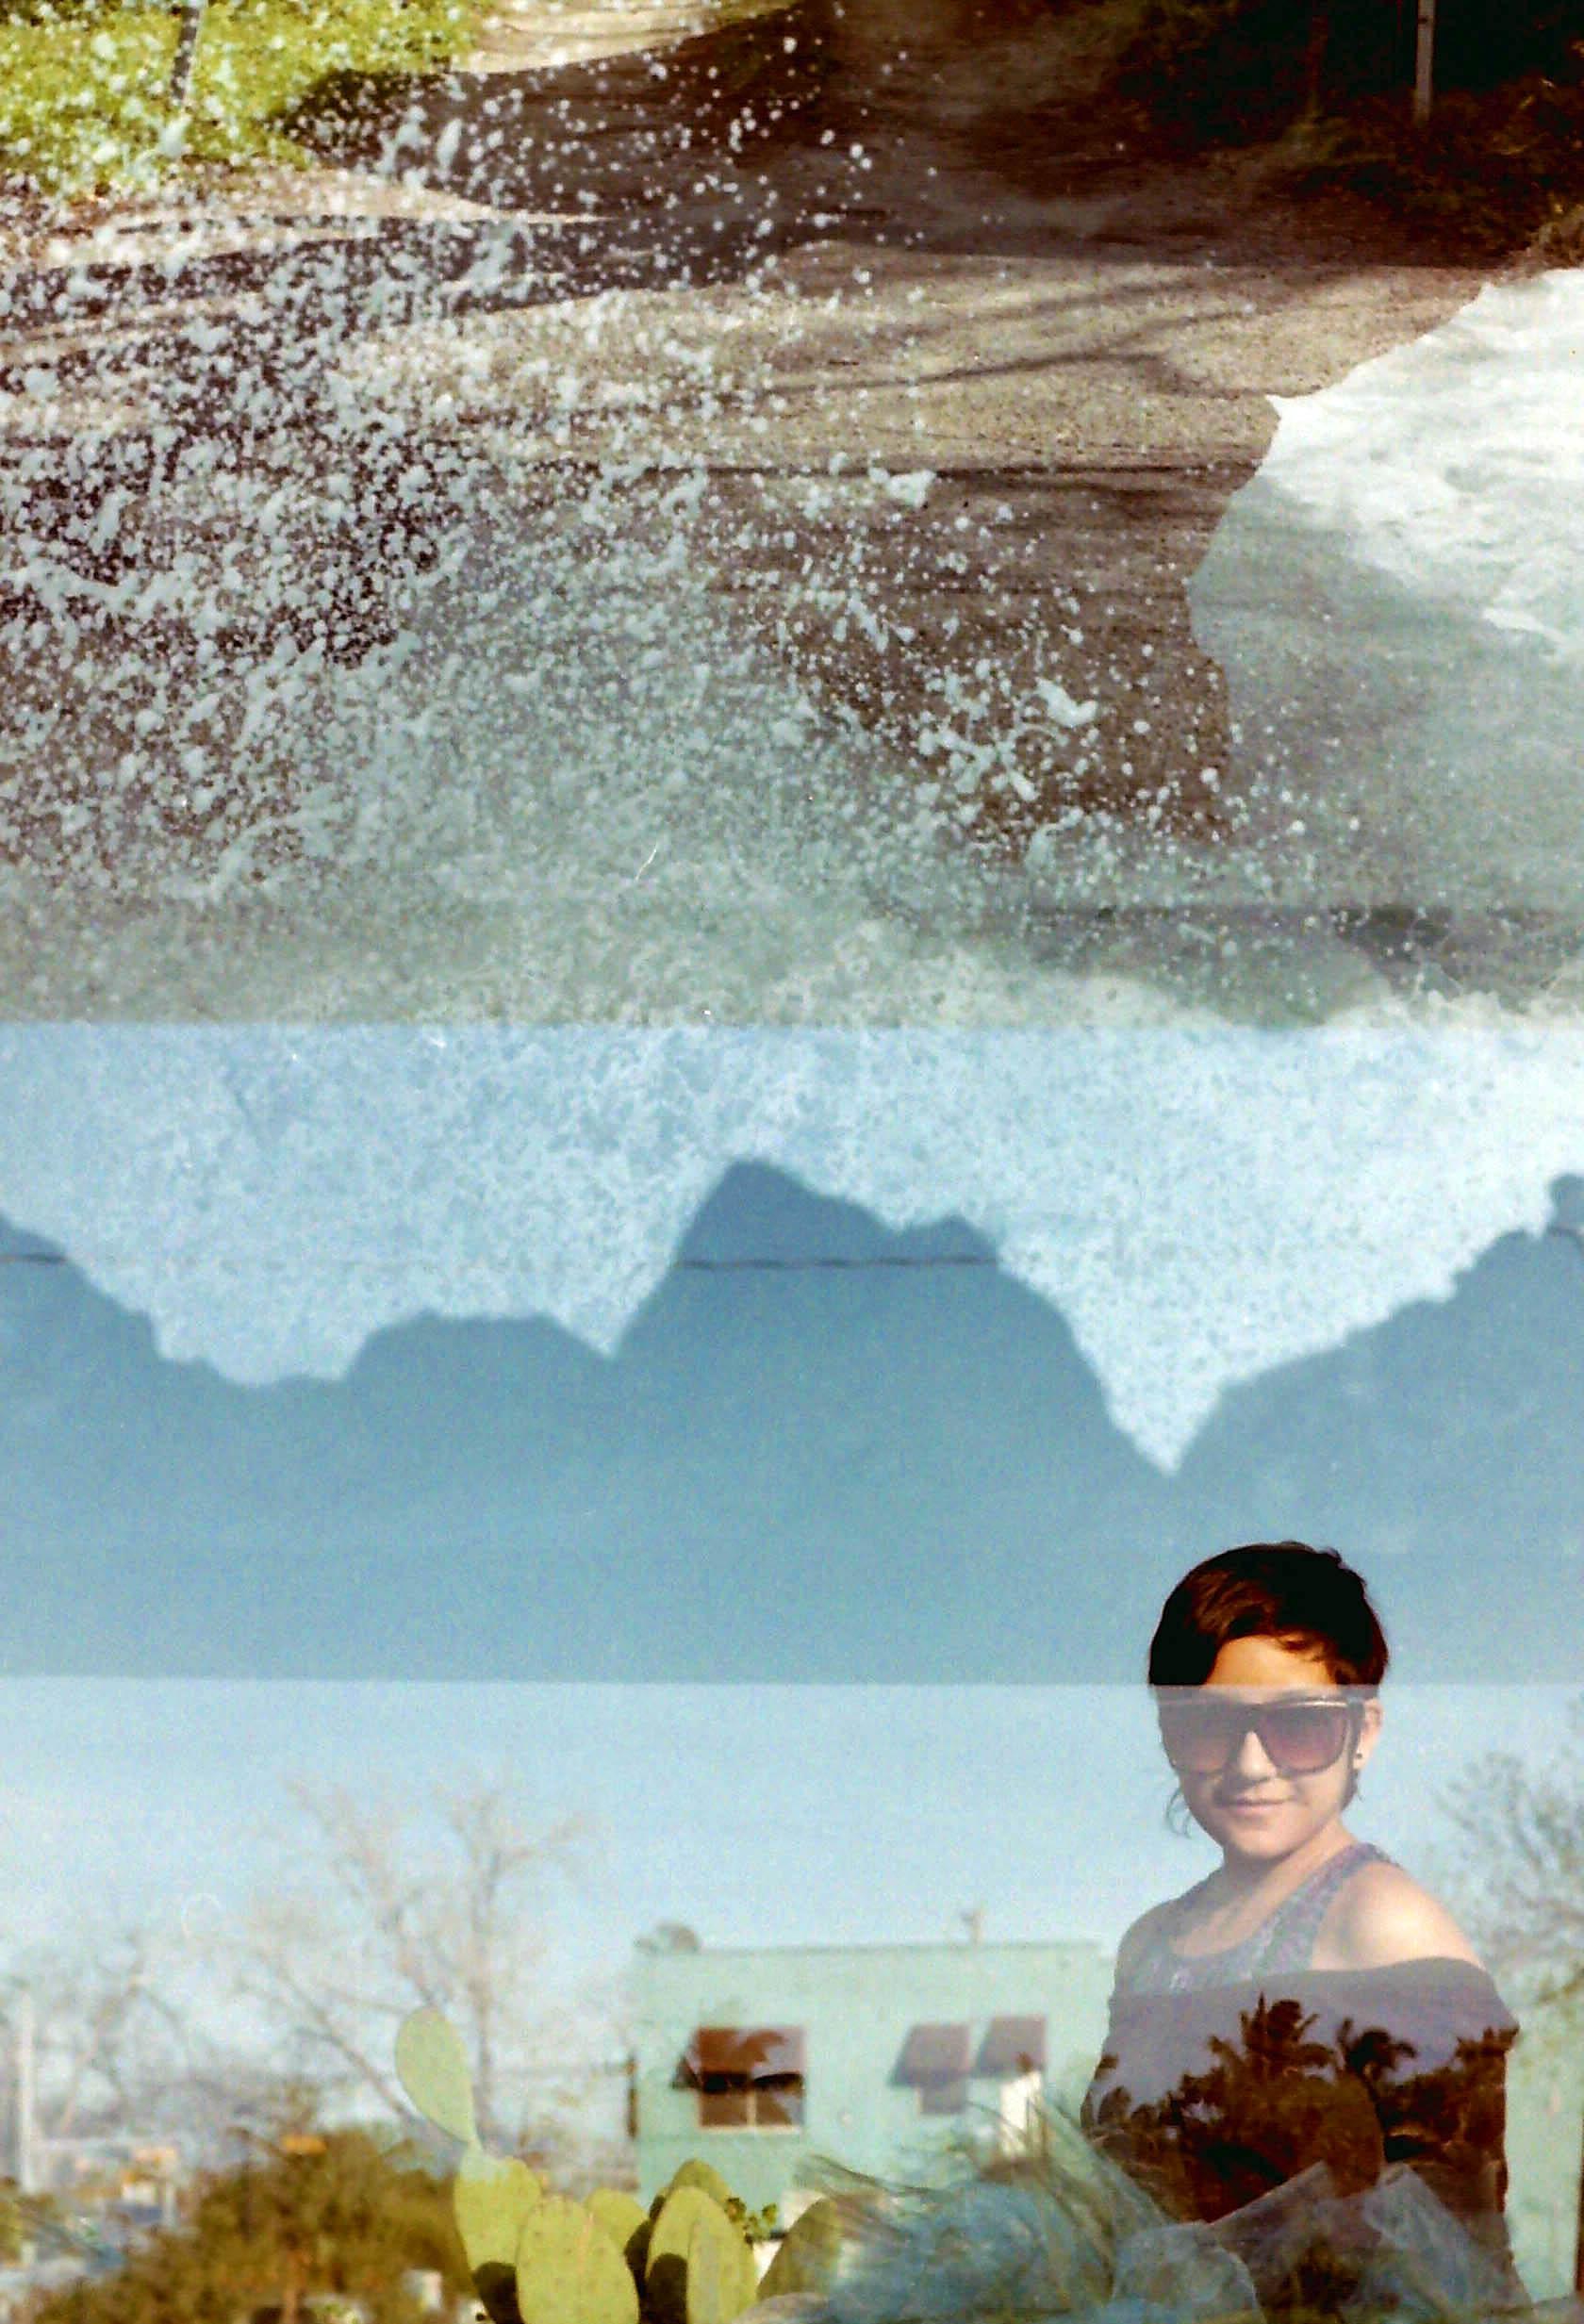 triple_exposure_film_portrait.jpg